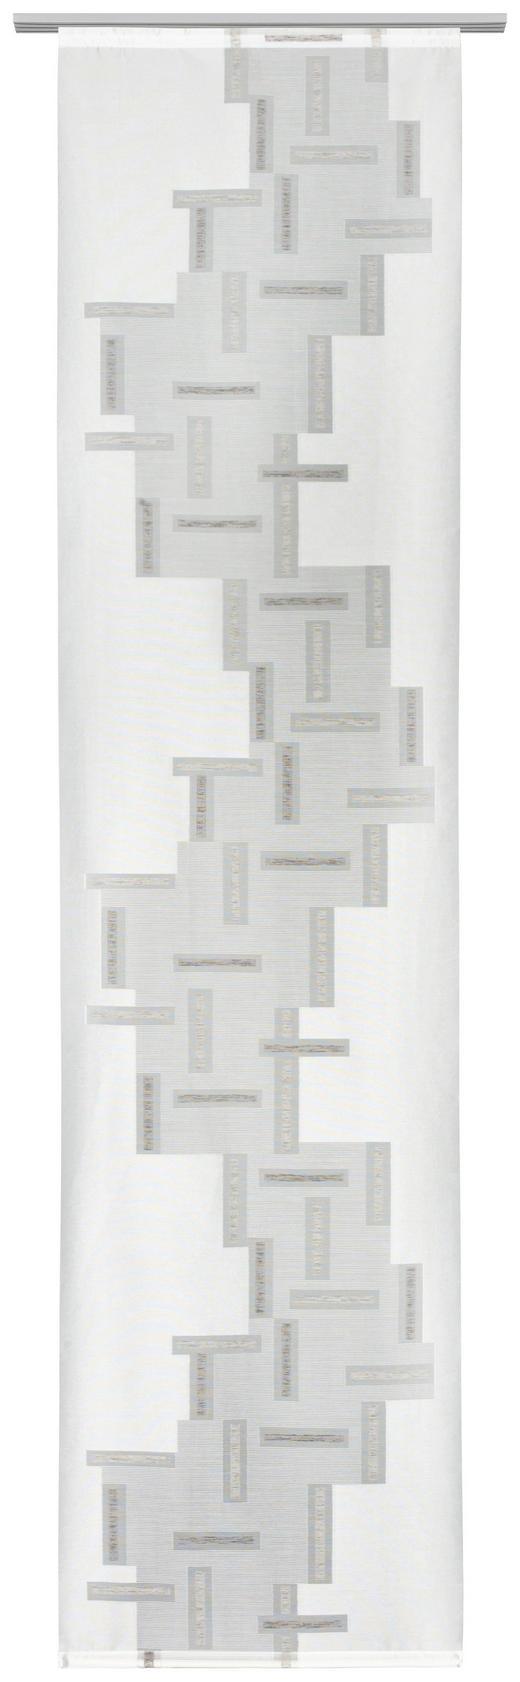 FLÄCHENVORHANG   transparent   60/245 cm - Braun, Design, Textil (60/245cm) - Novel